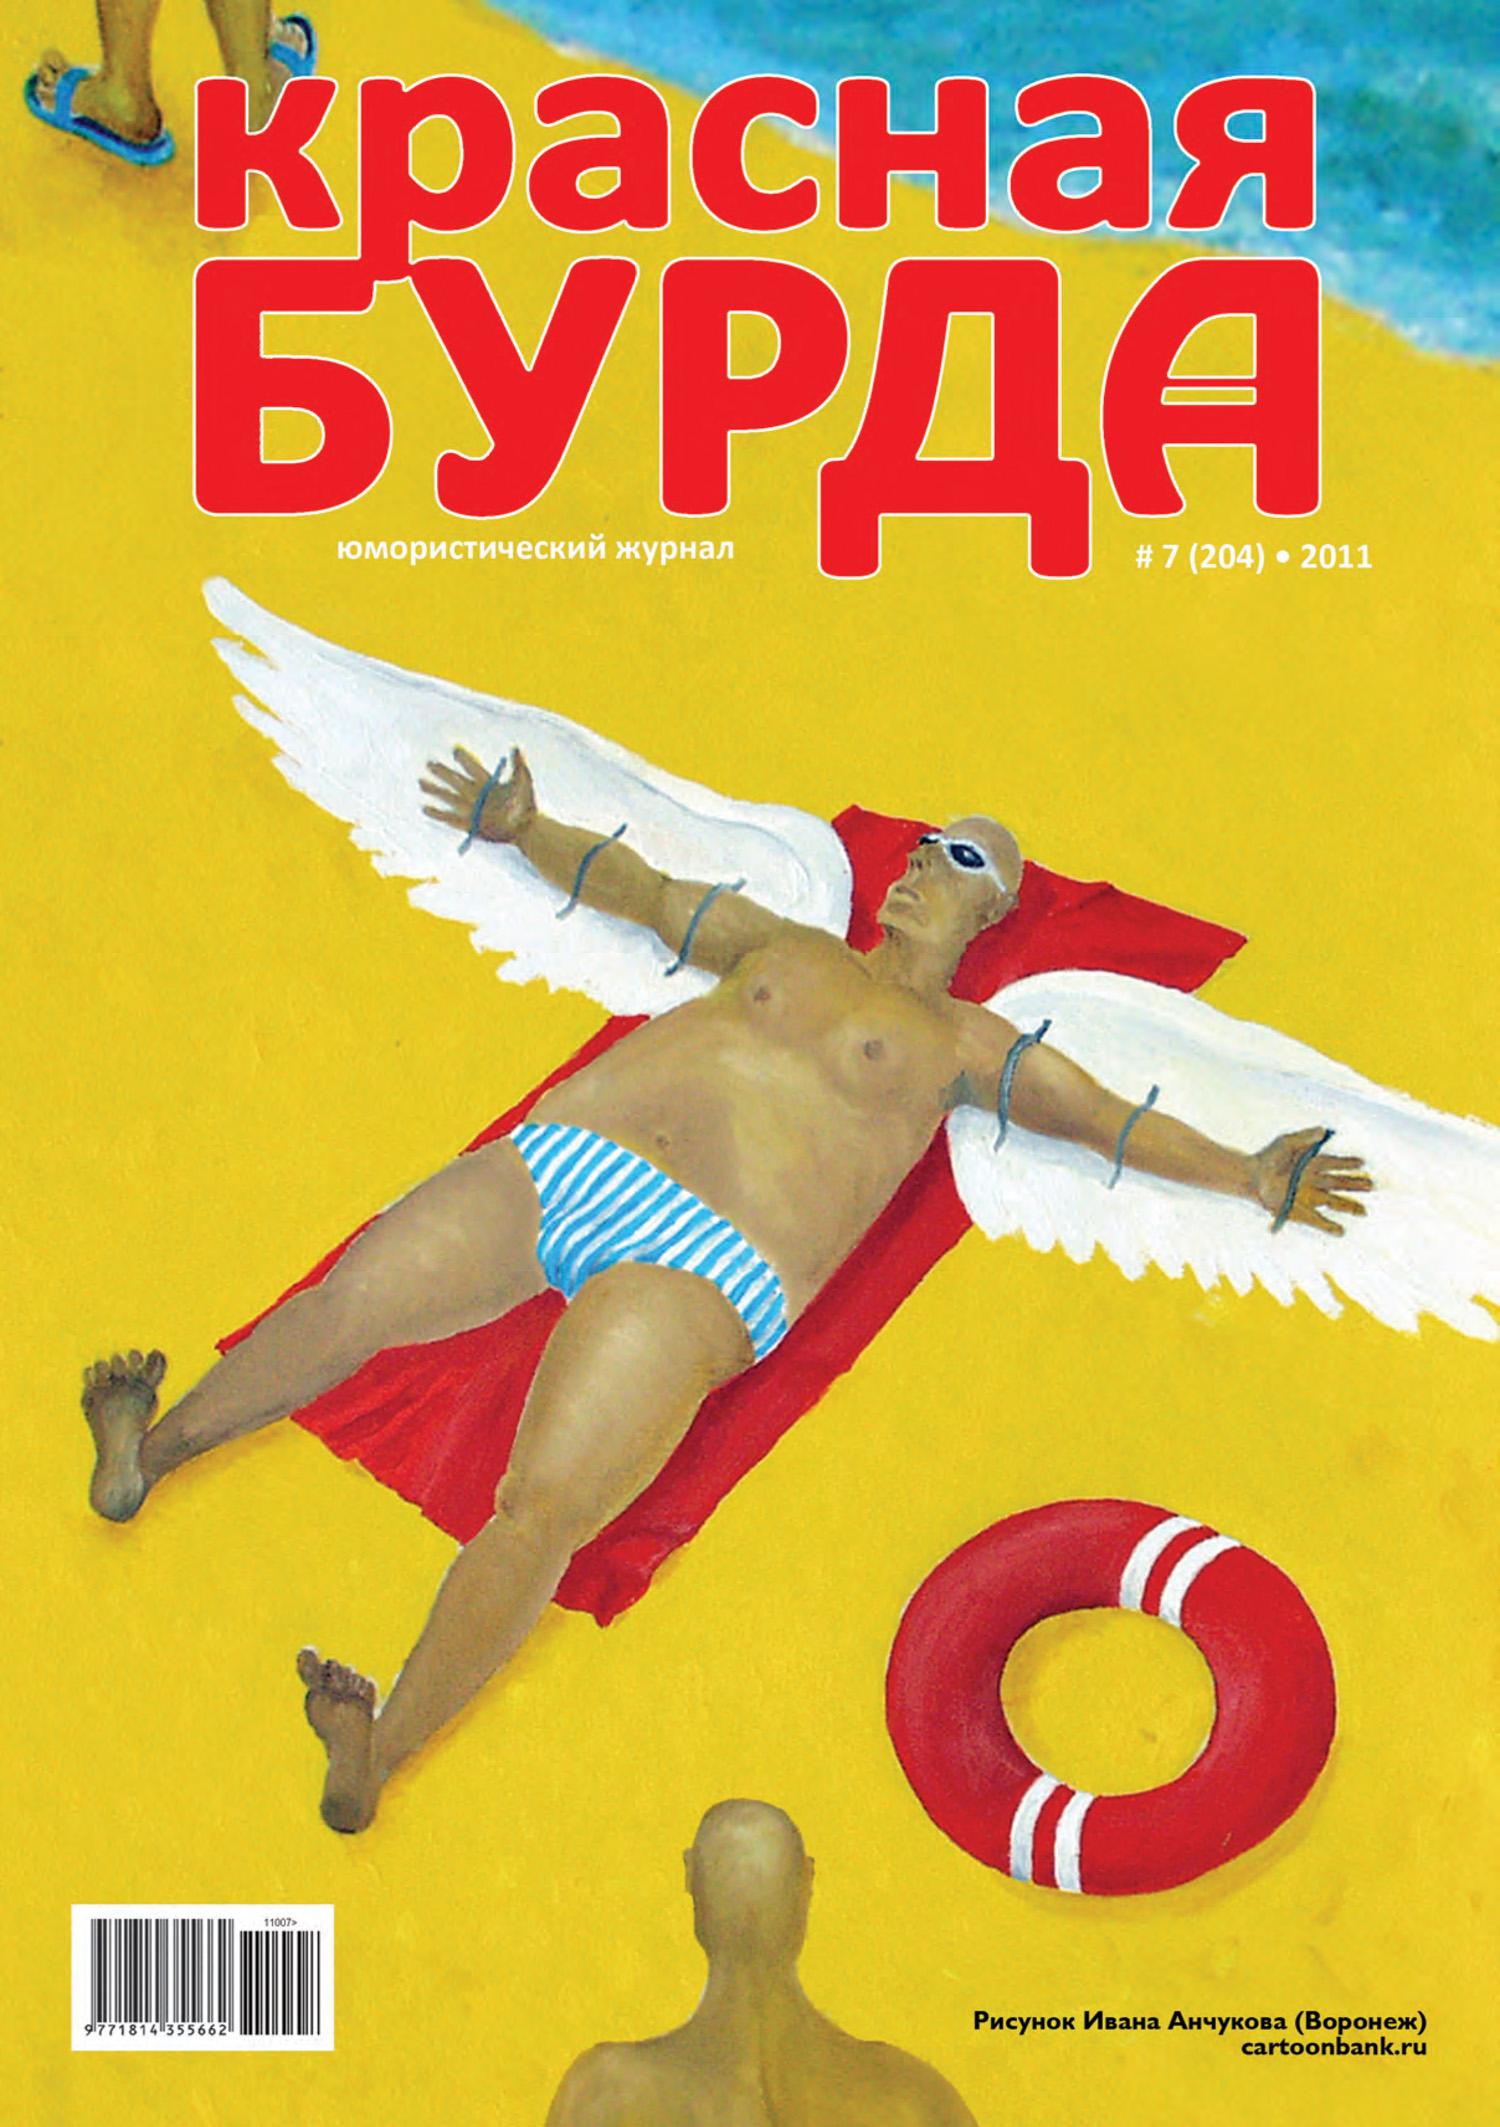 Красная бурда. Юмористический журнал №7 (204) 2011